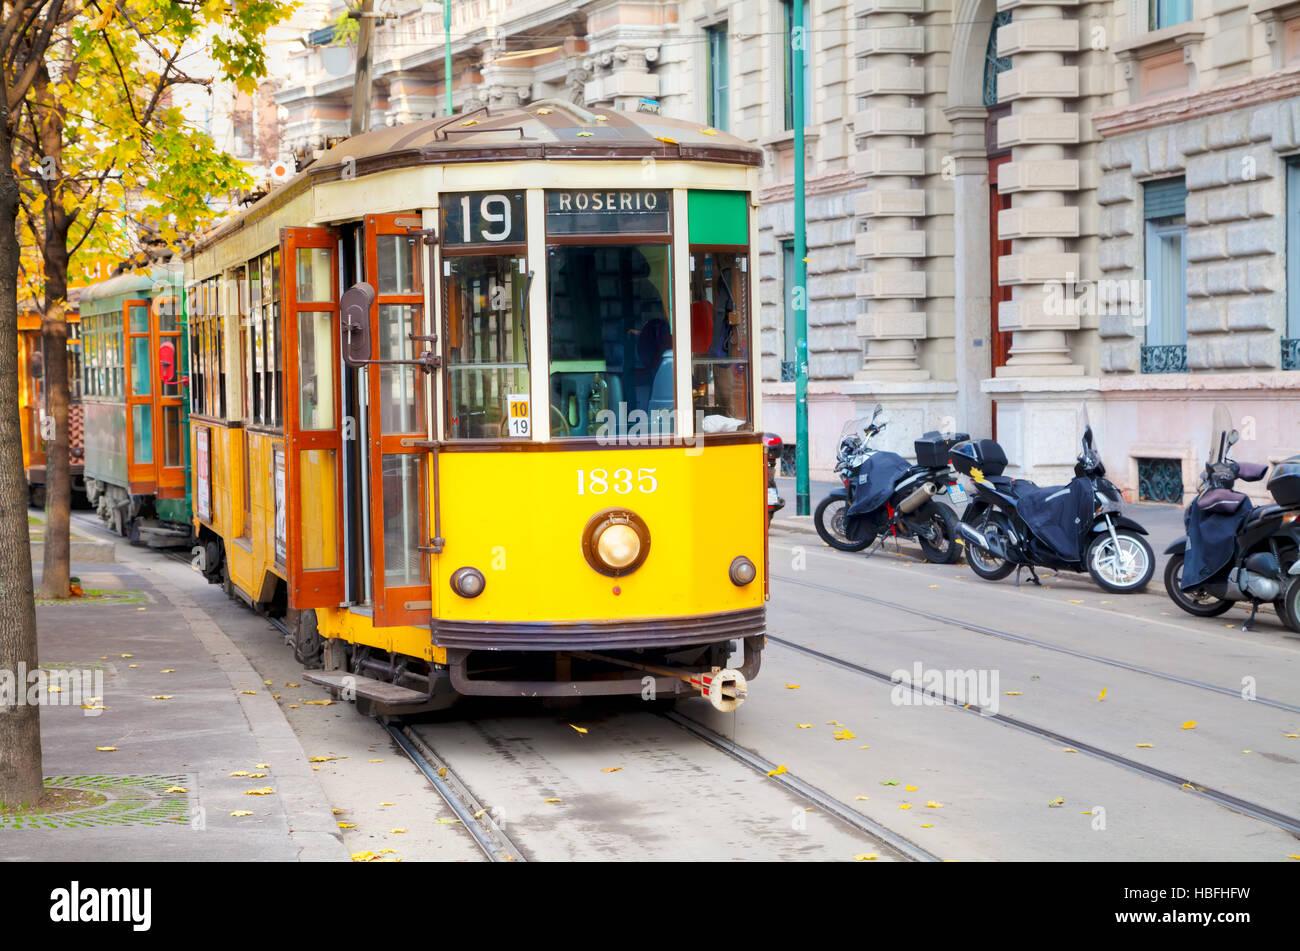 Old tram in Milan, Italy - Stock Image